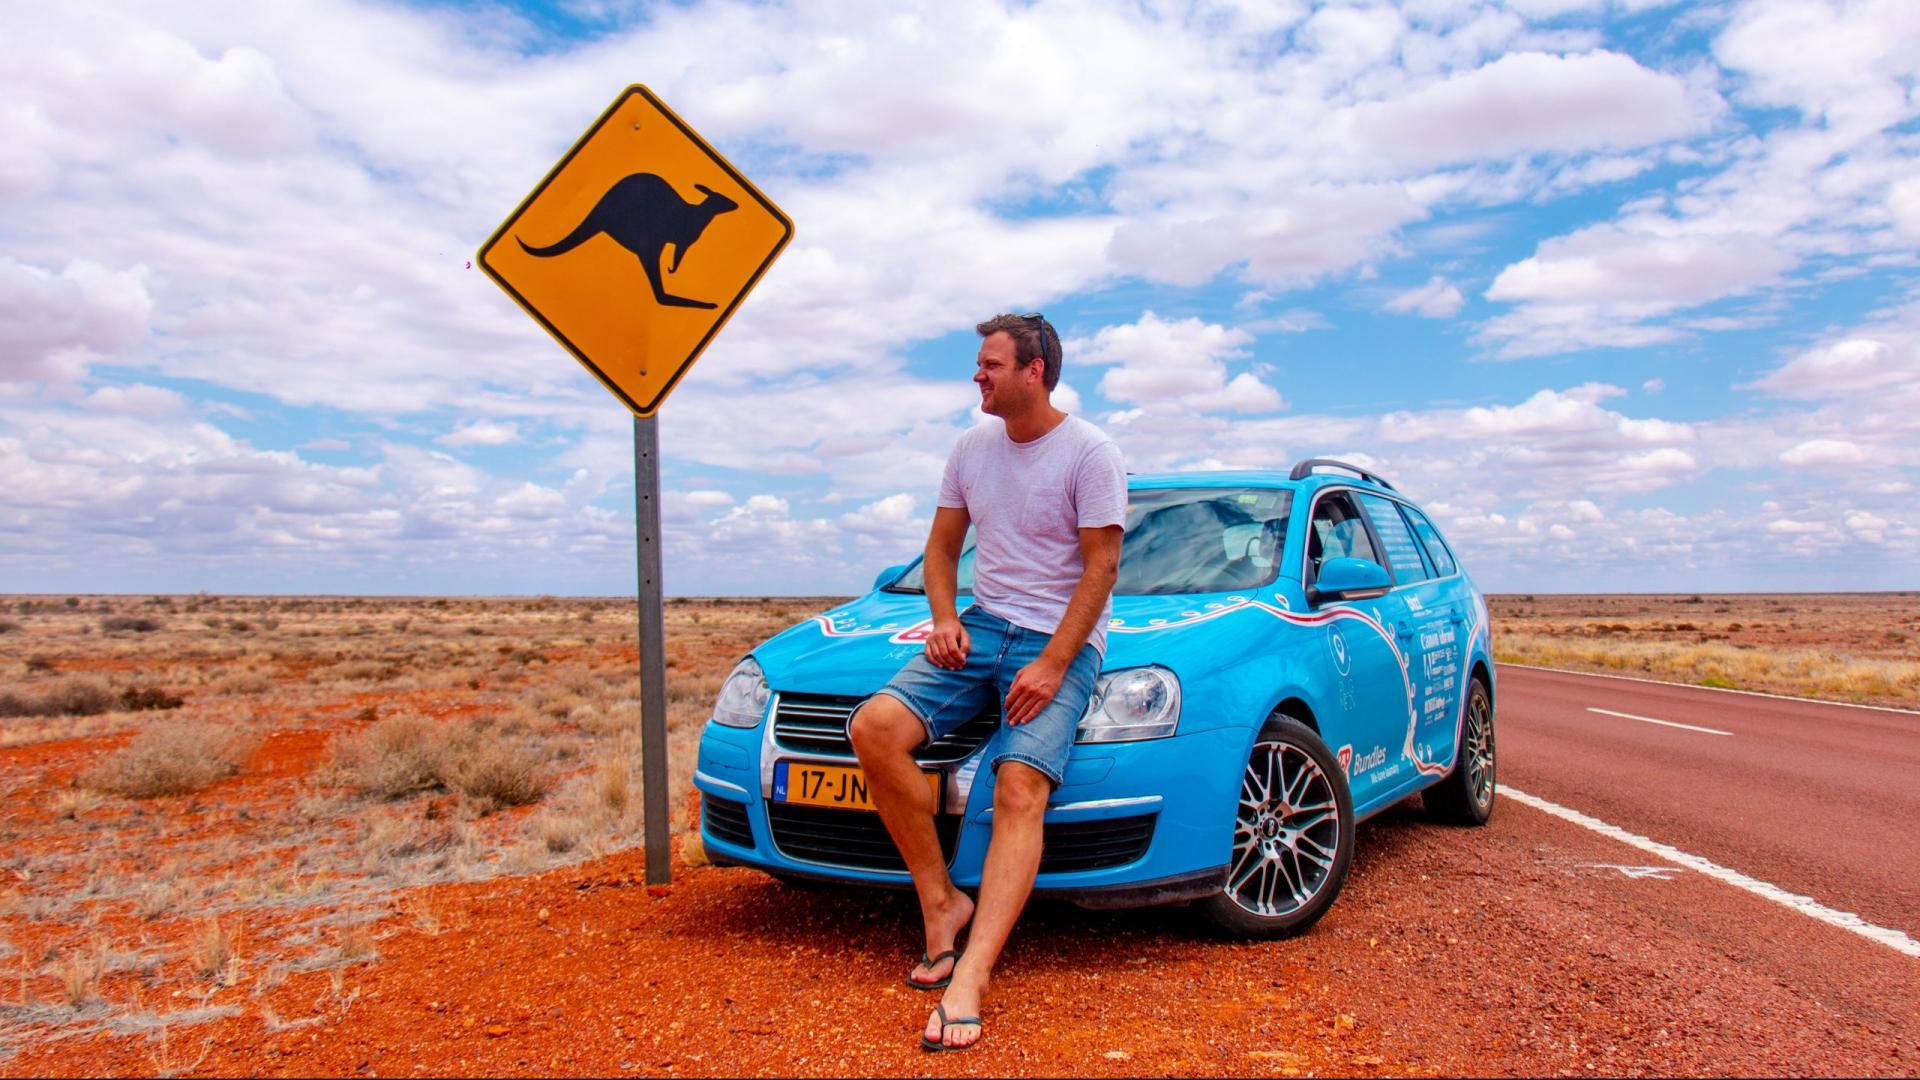 Elektrische Volkswagen Golf in Australie